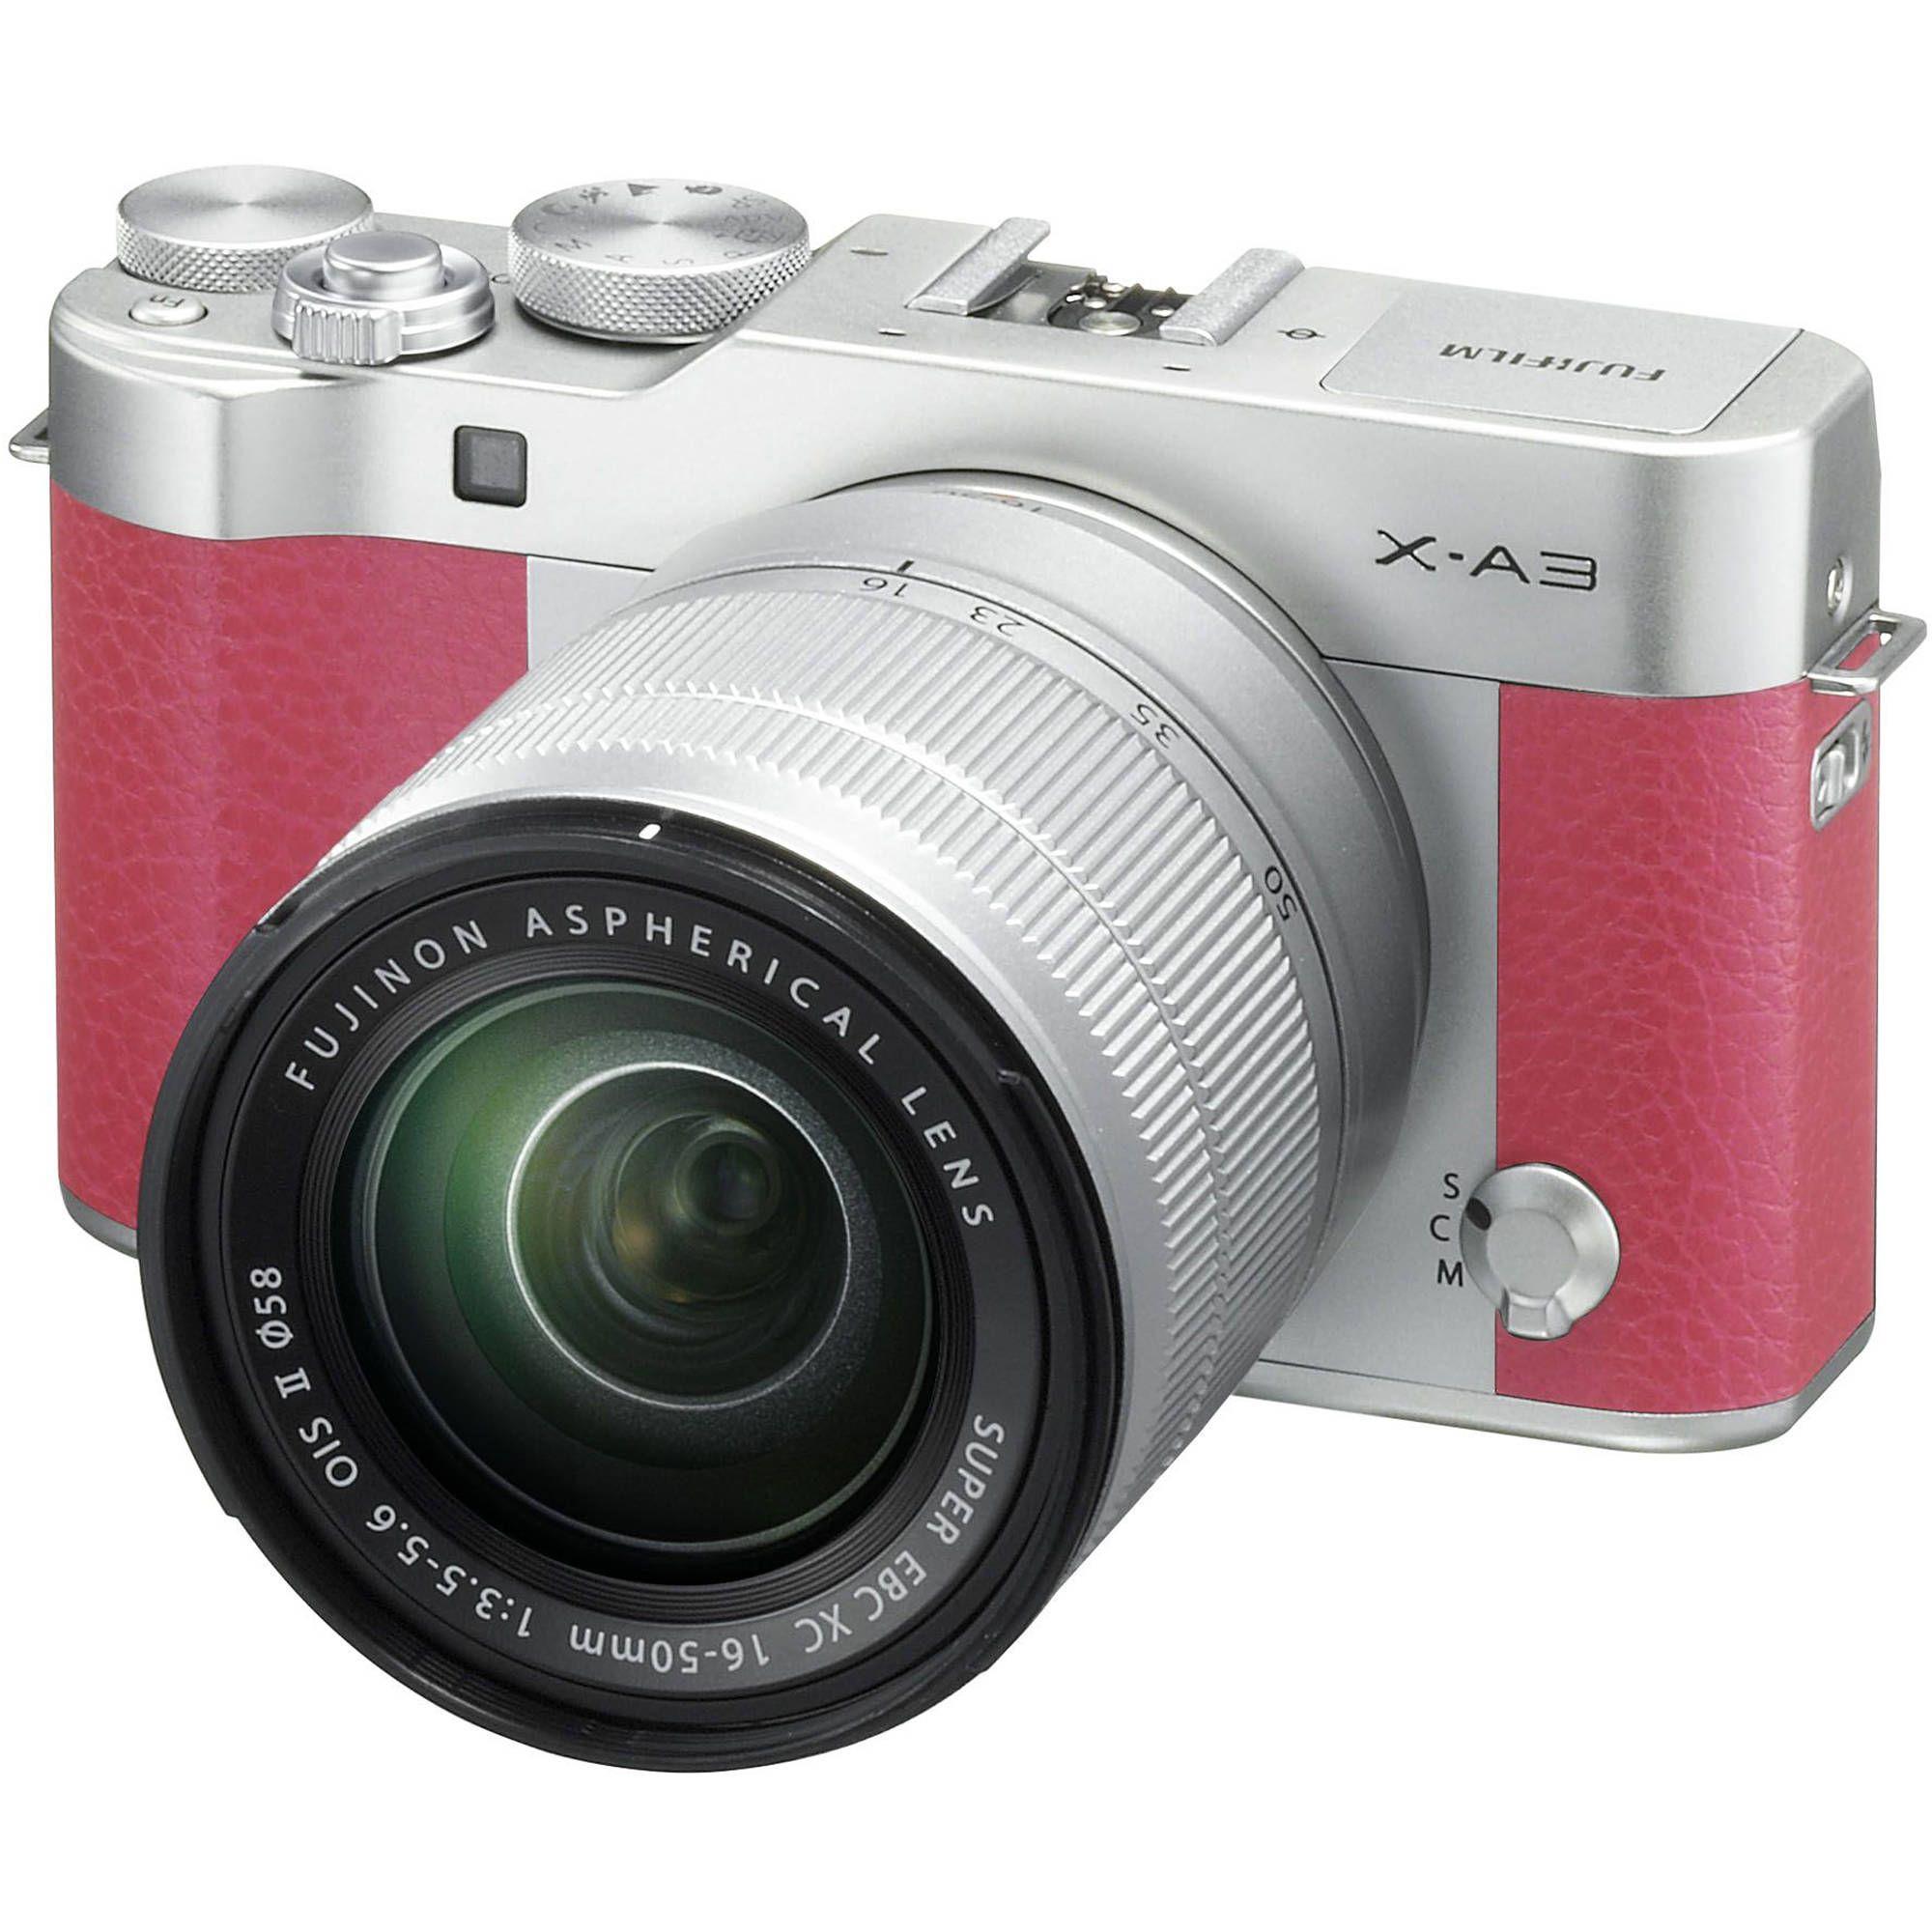 Fujifilm X A3 Mirrorless Digital Camera With 16 50mm Lens Pink X100s Iphone 5 Custom Hard Case